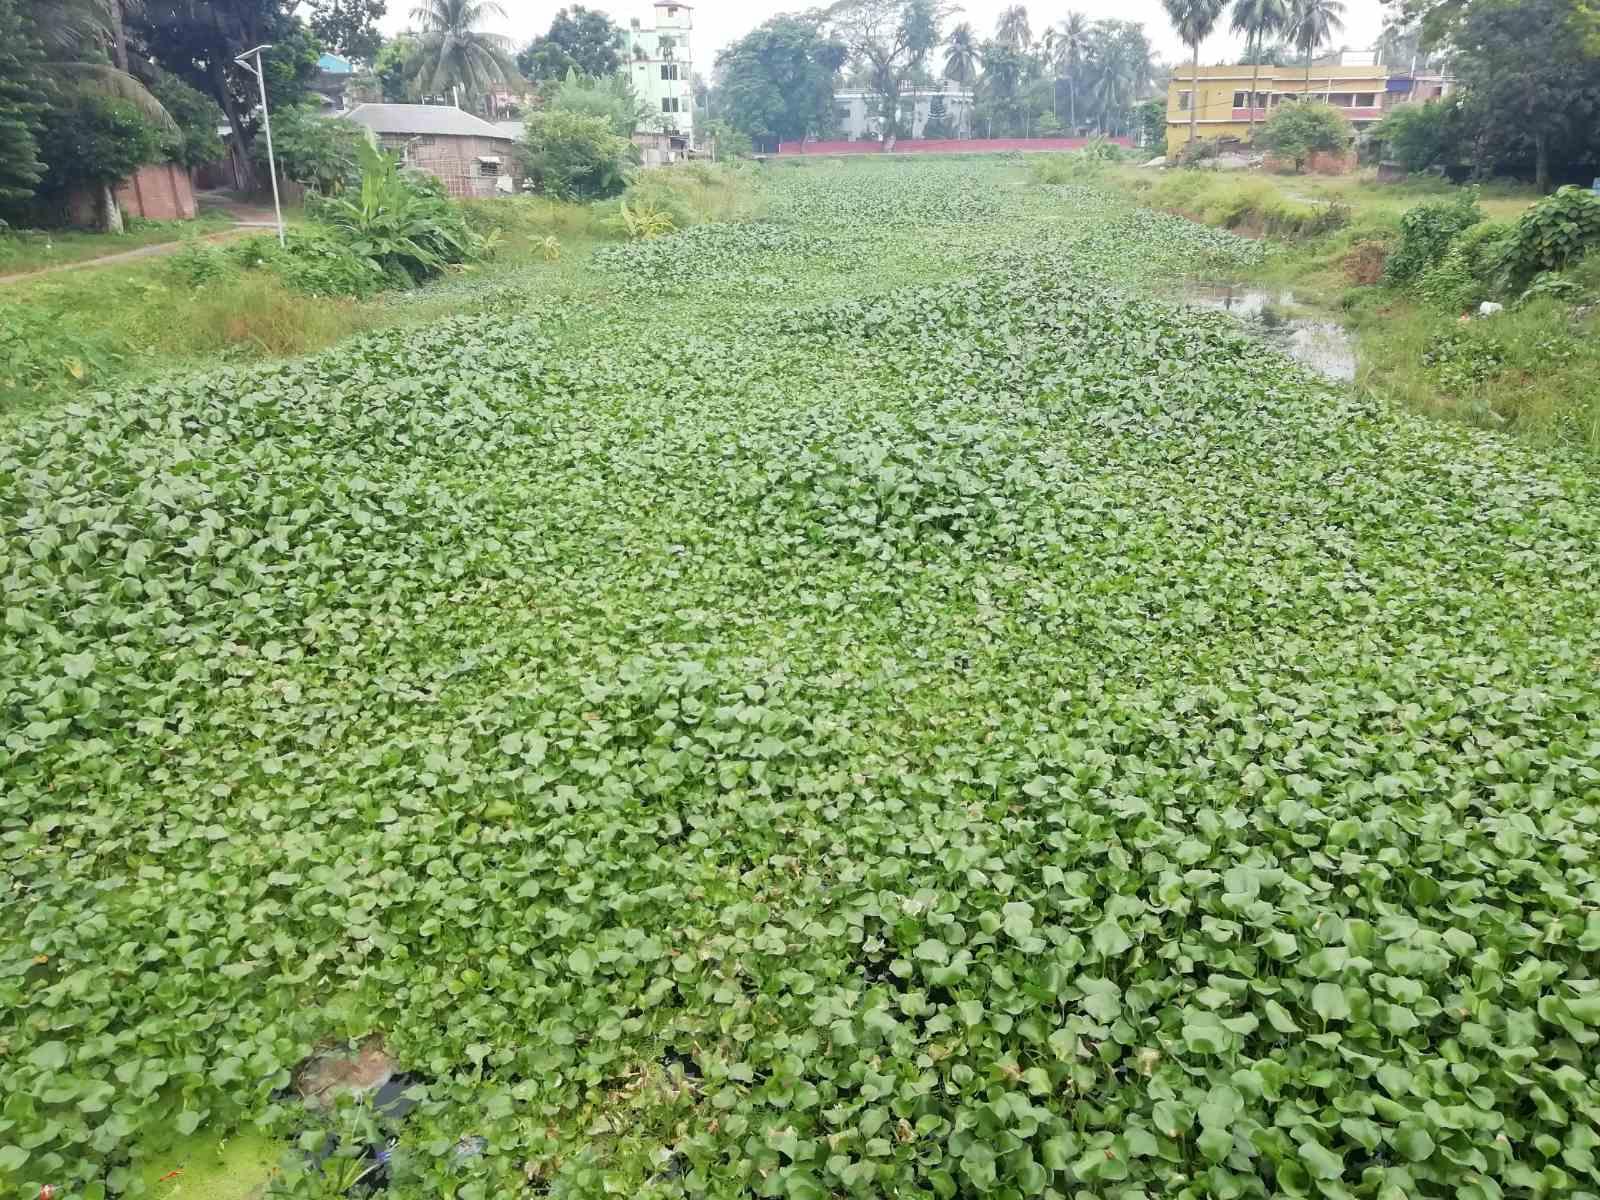 Ichamati-River-Pabna-Bangladesh-on-August-2021-4.jpg